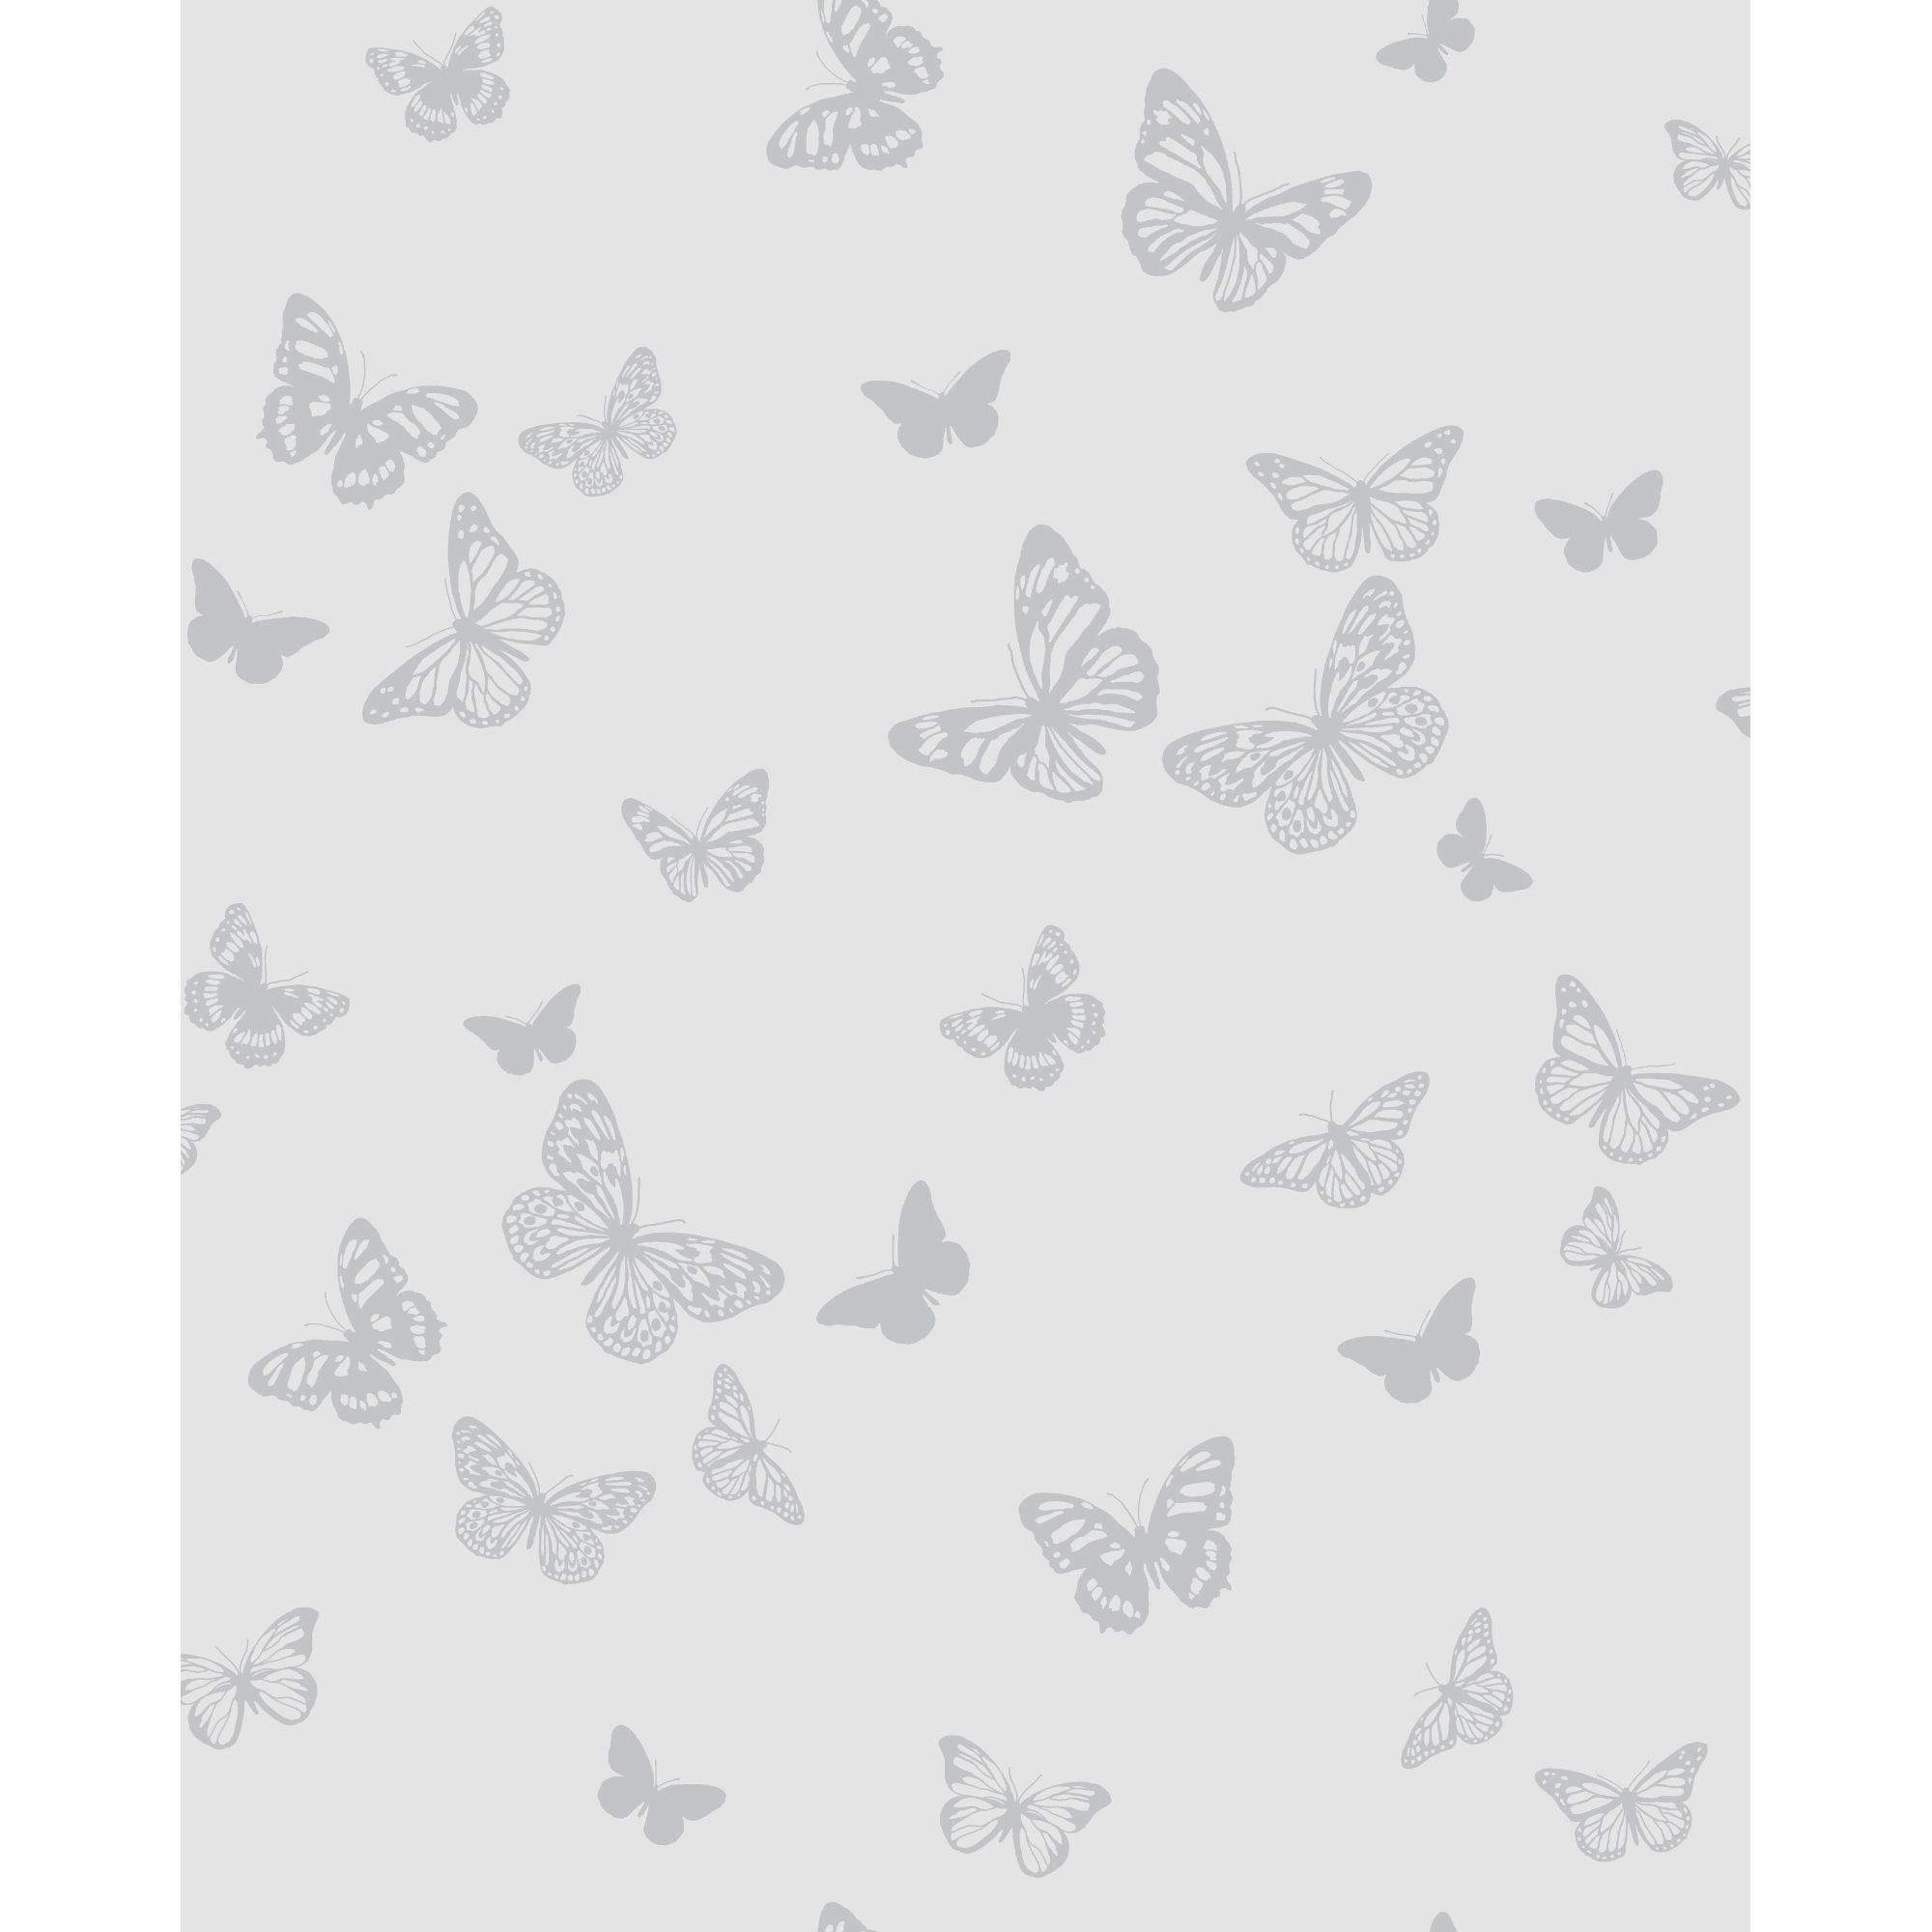 Butterfly Wallpaper Uk Google Search New House Pinterest